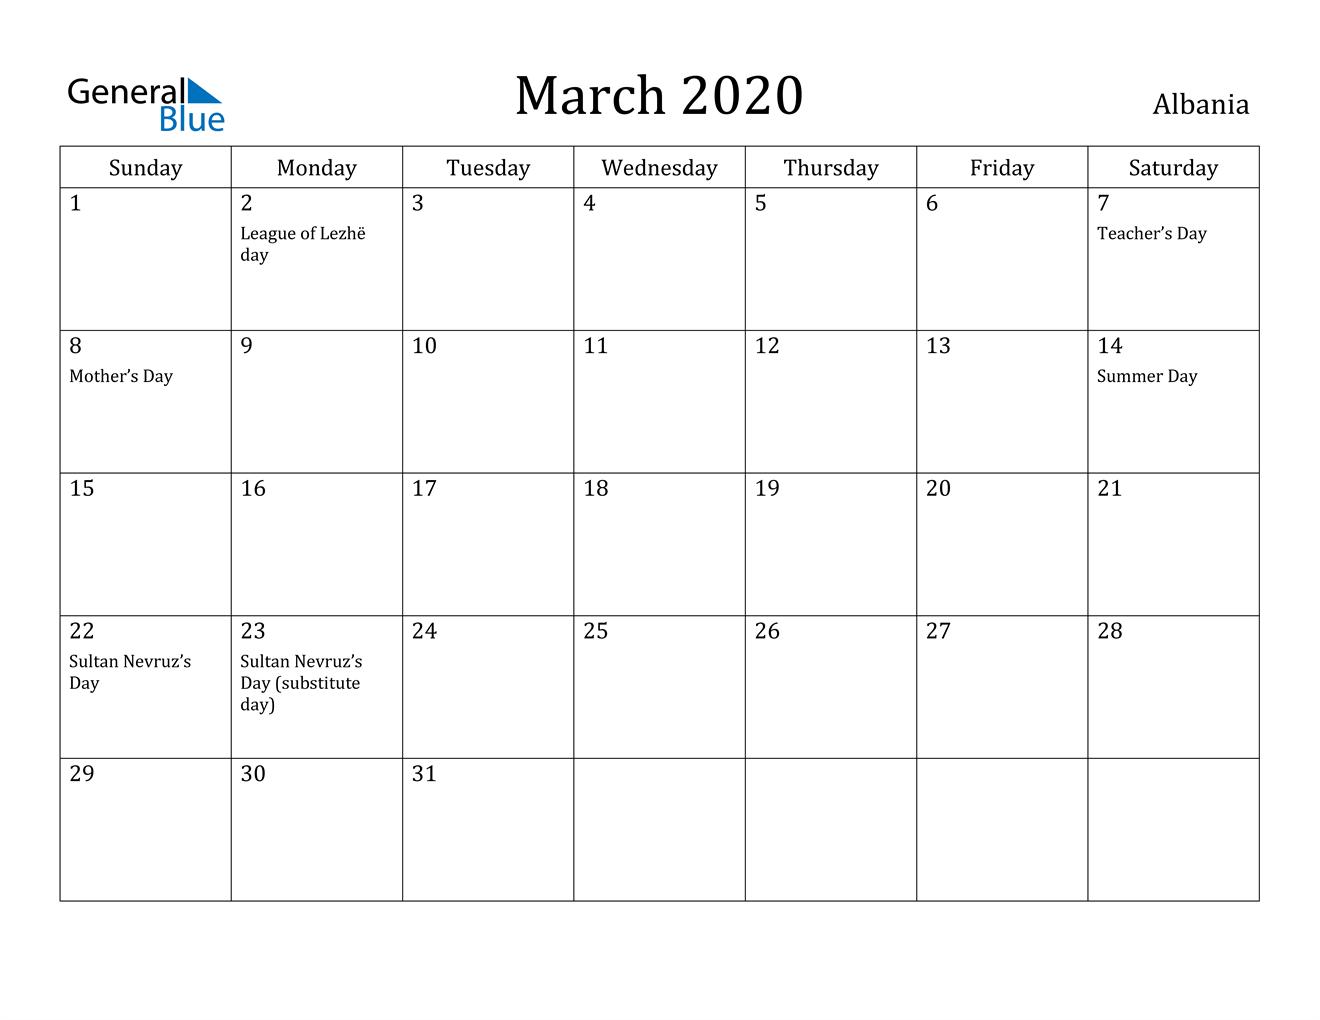 Image of March 2020 Albania Calendar with Holidays Calendar